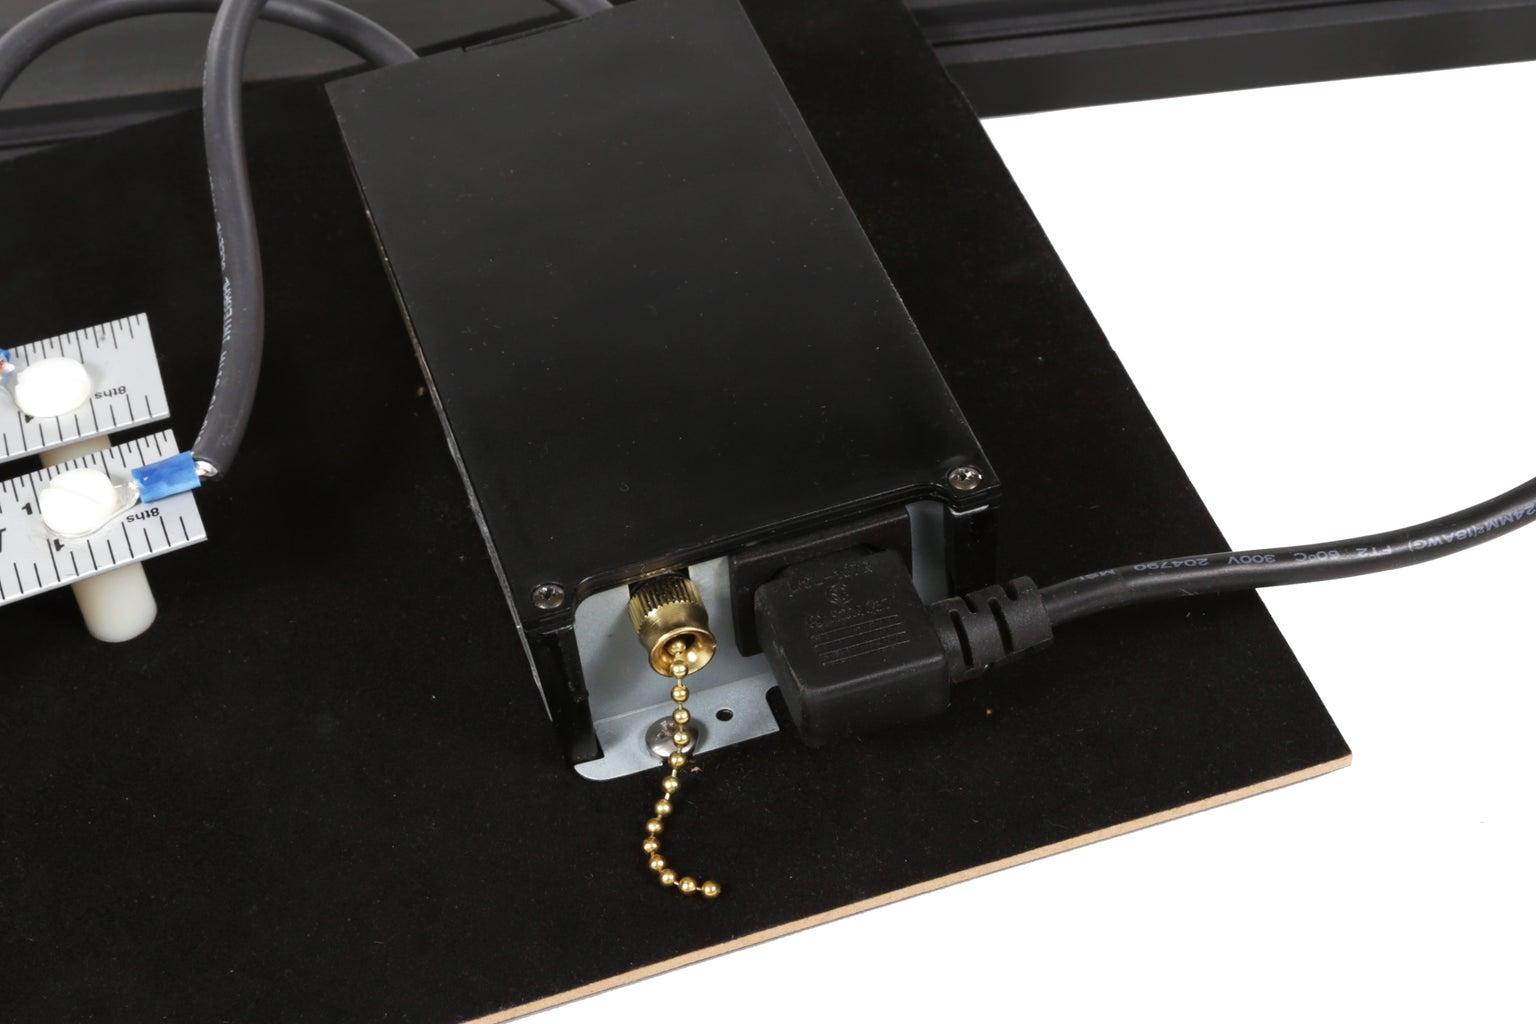 Attach the Plug